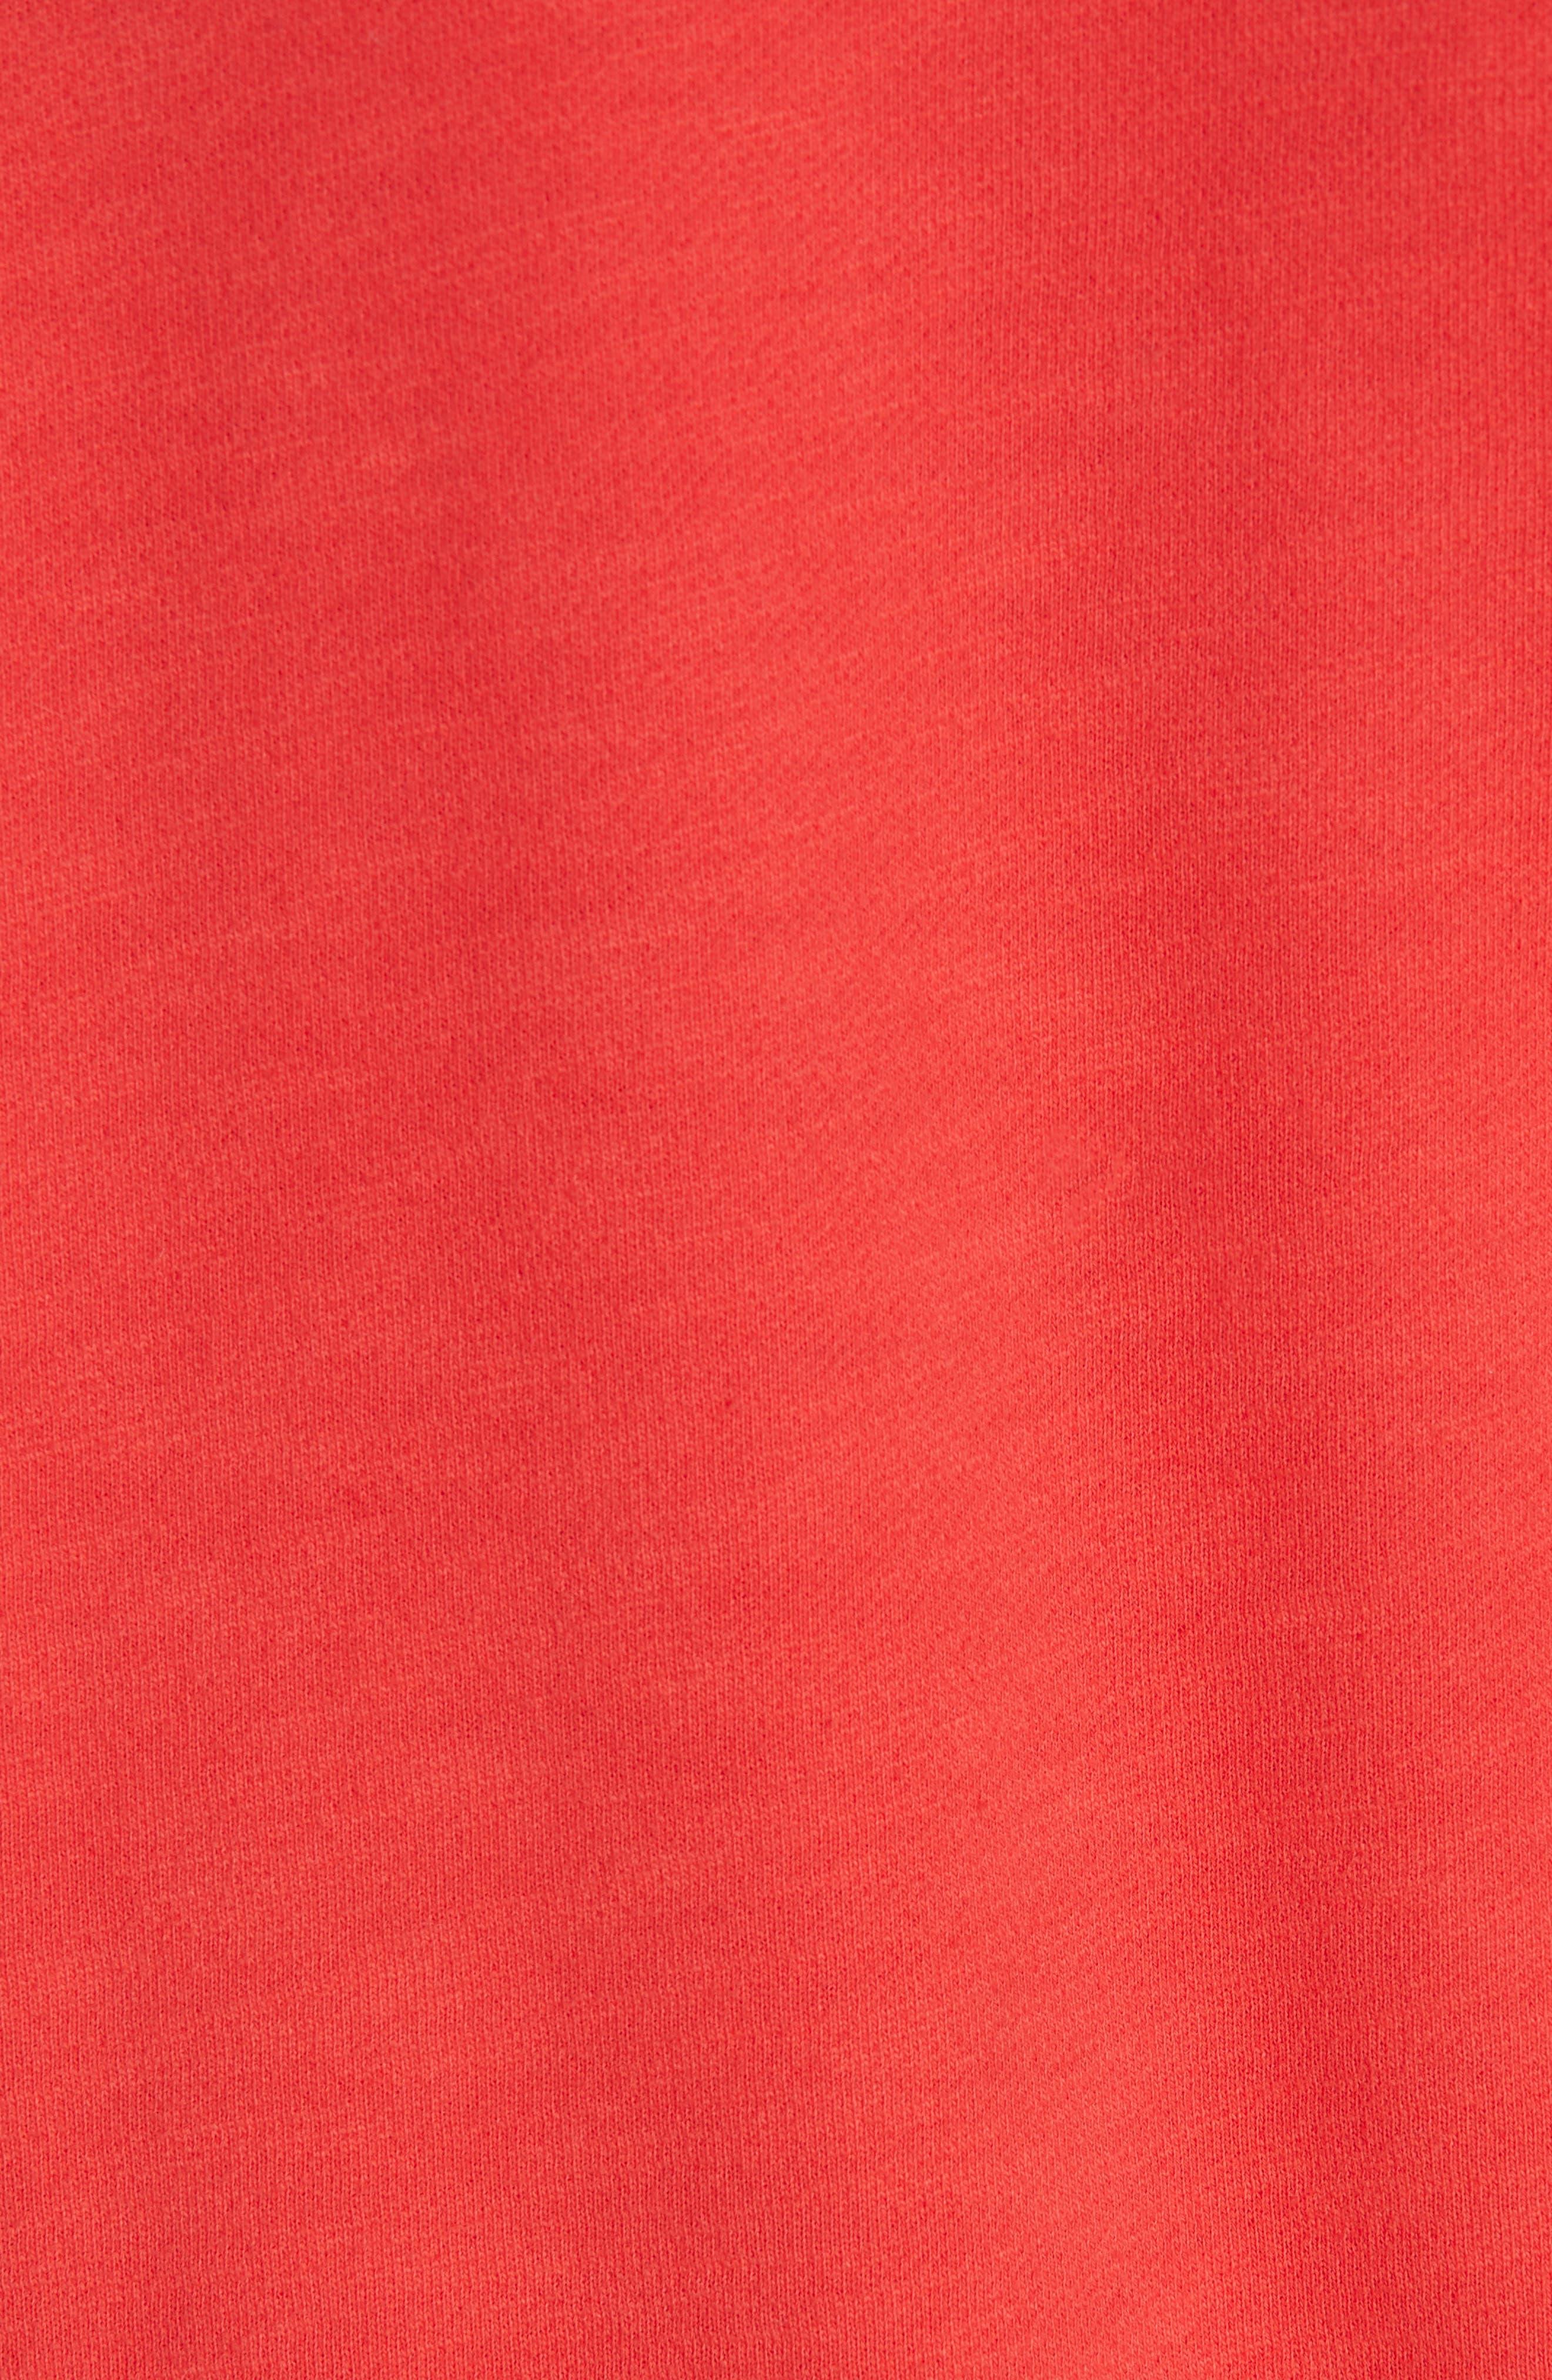 rag & bone Hello Sweatshirt,                             Alternate thumbnail 5, color,                             950